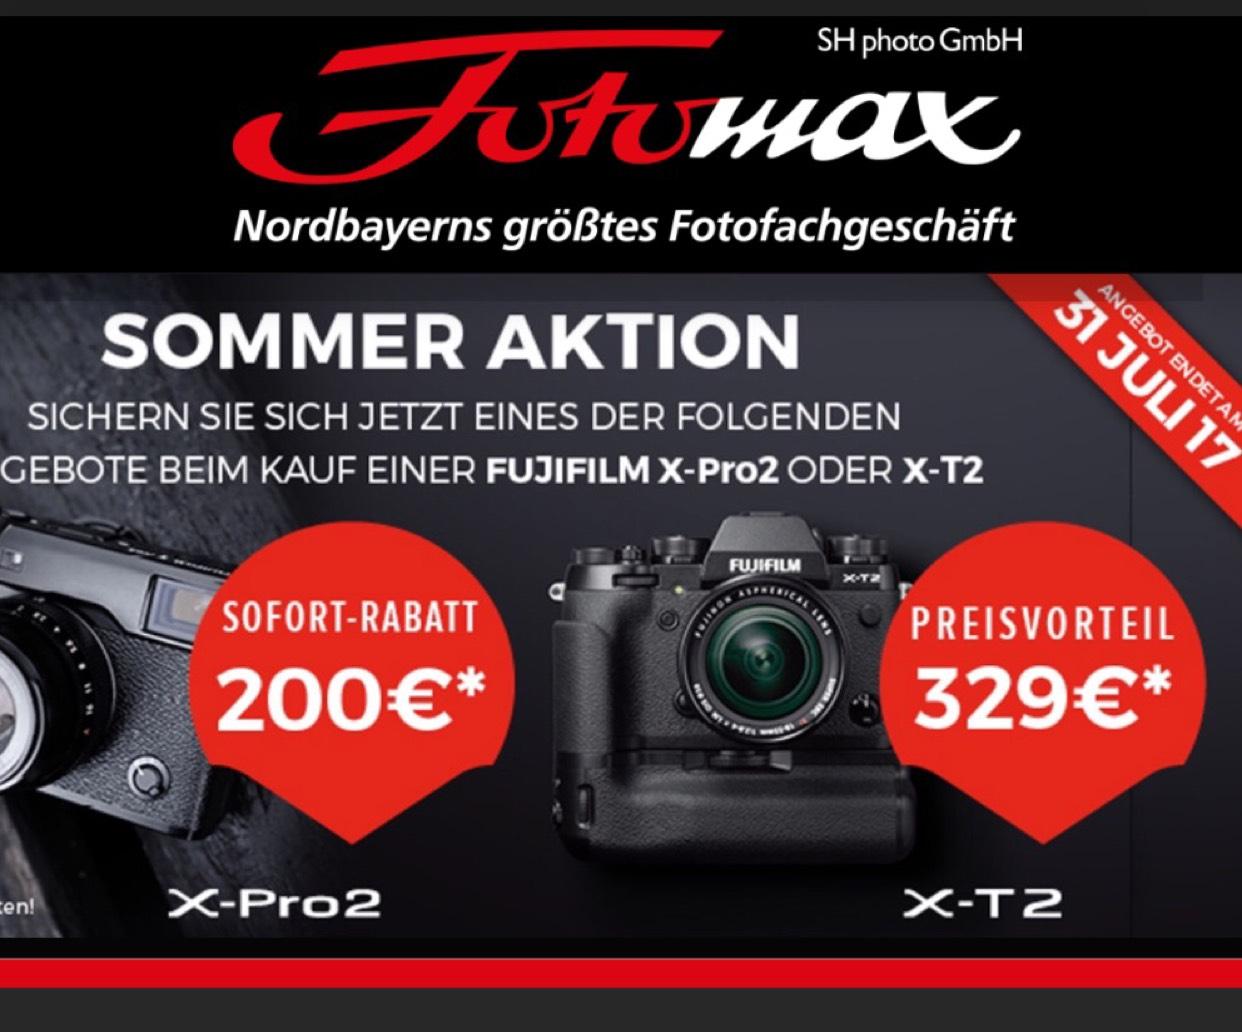 Fujifilm X-T2 inkl. 18-55mm 1:2,8-4,0 schwarz + Handgriff VPB-XT2 GRATIS